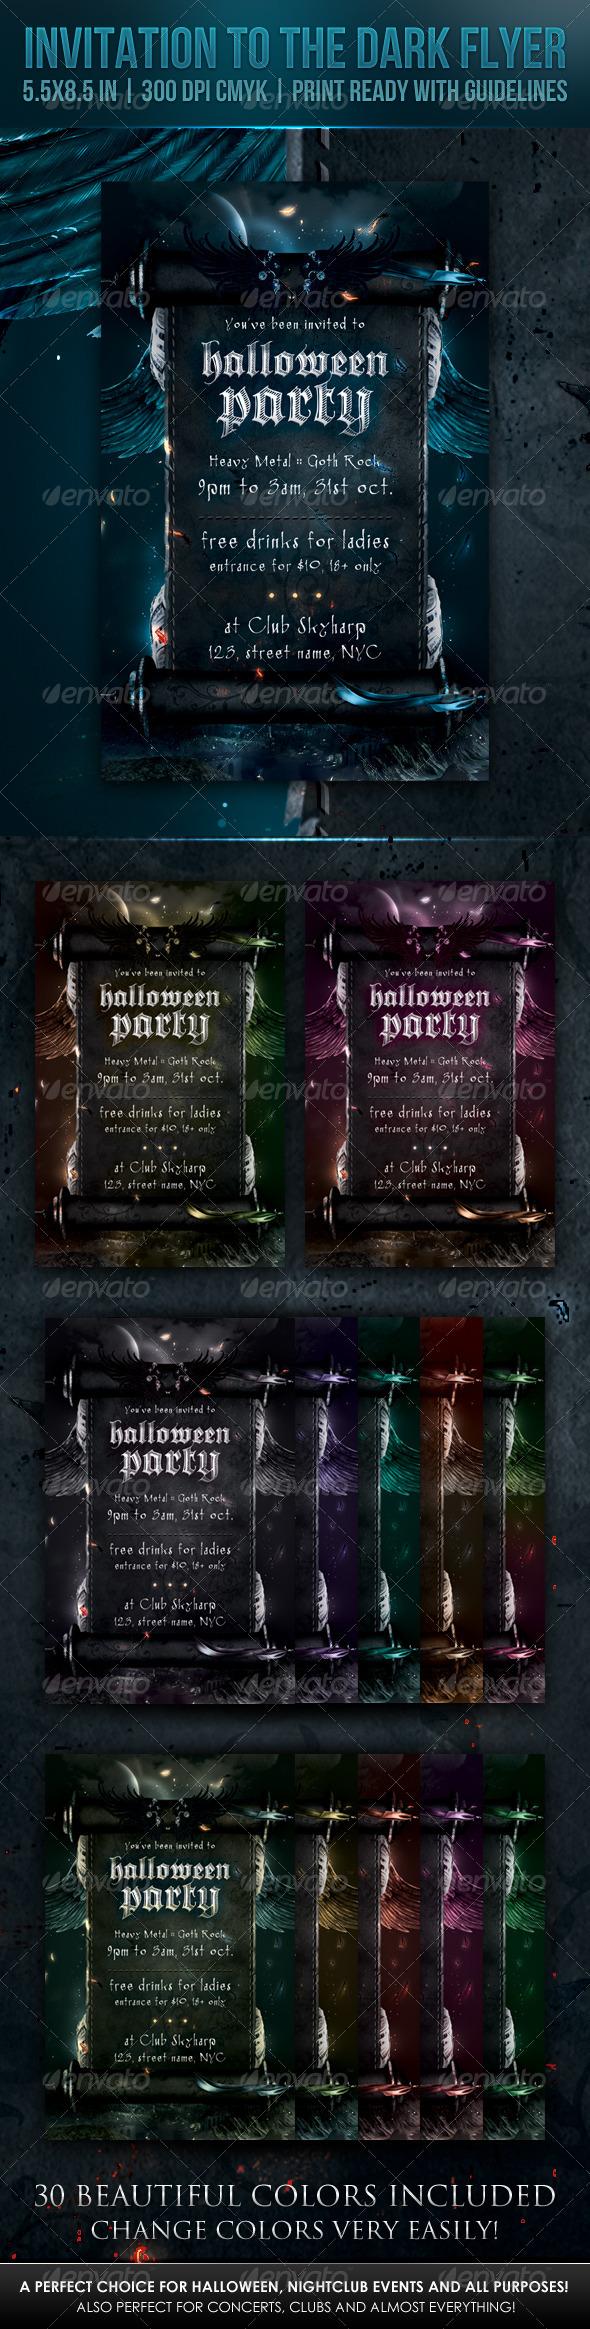 Invitation to the Dark Flyer - Print Templates